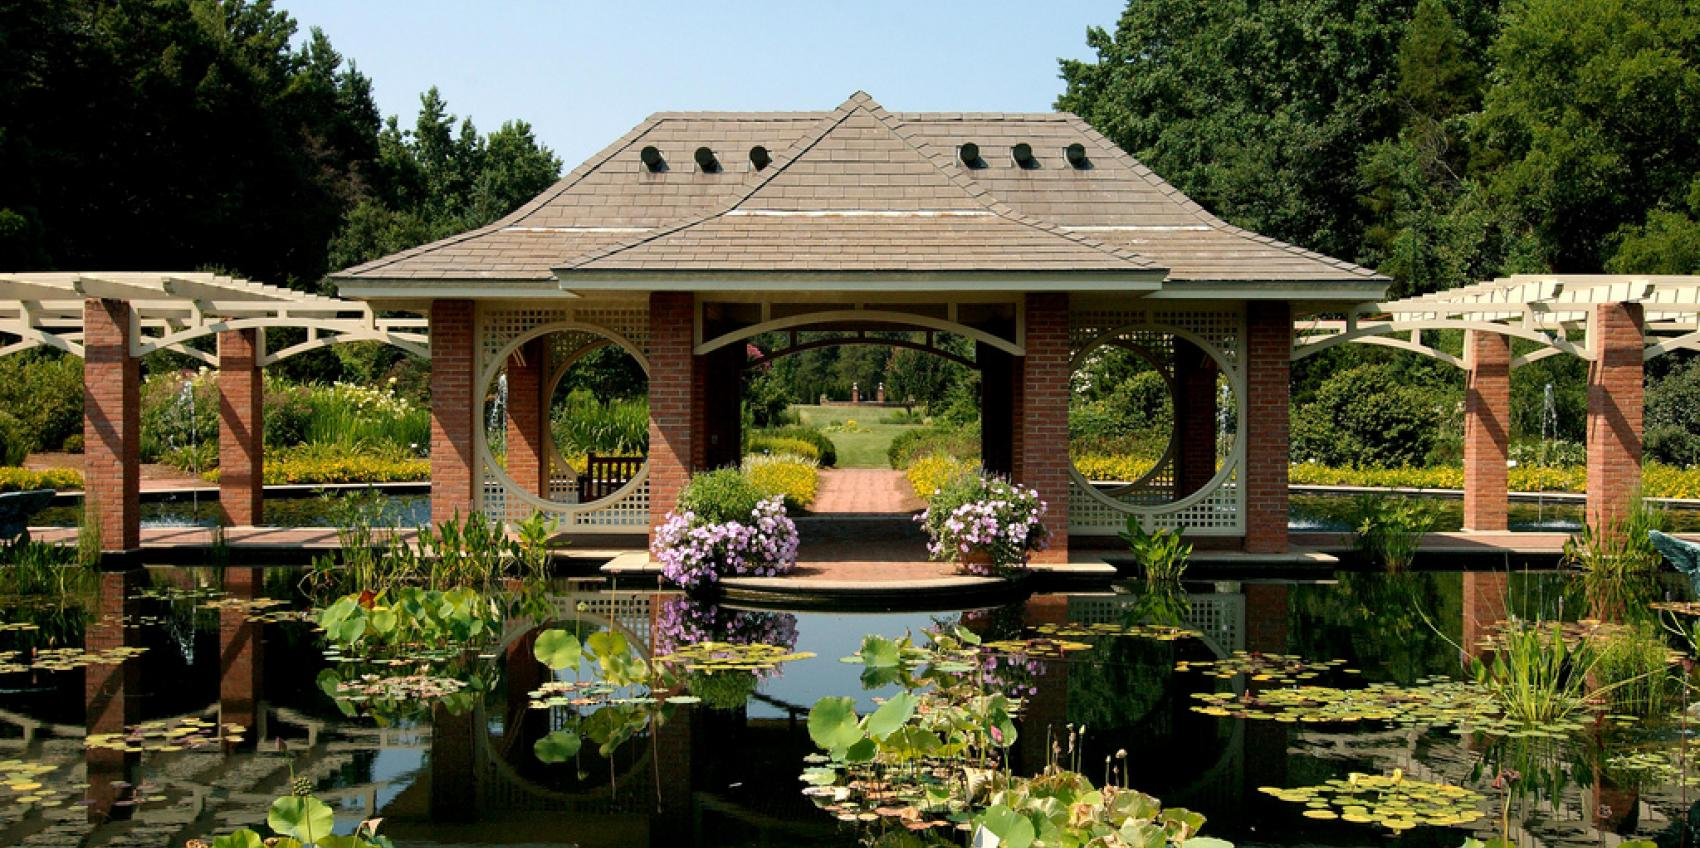 Huntsville botanical garden american public gardens - Huntsville botanical gardens hours ...